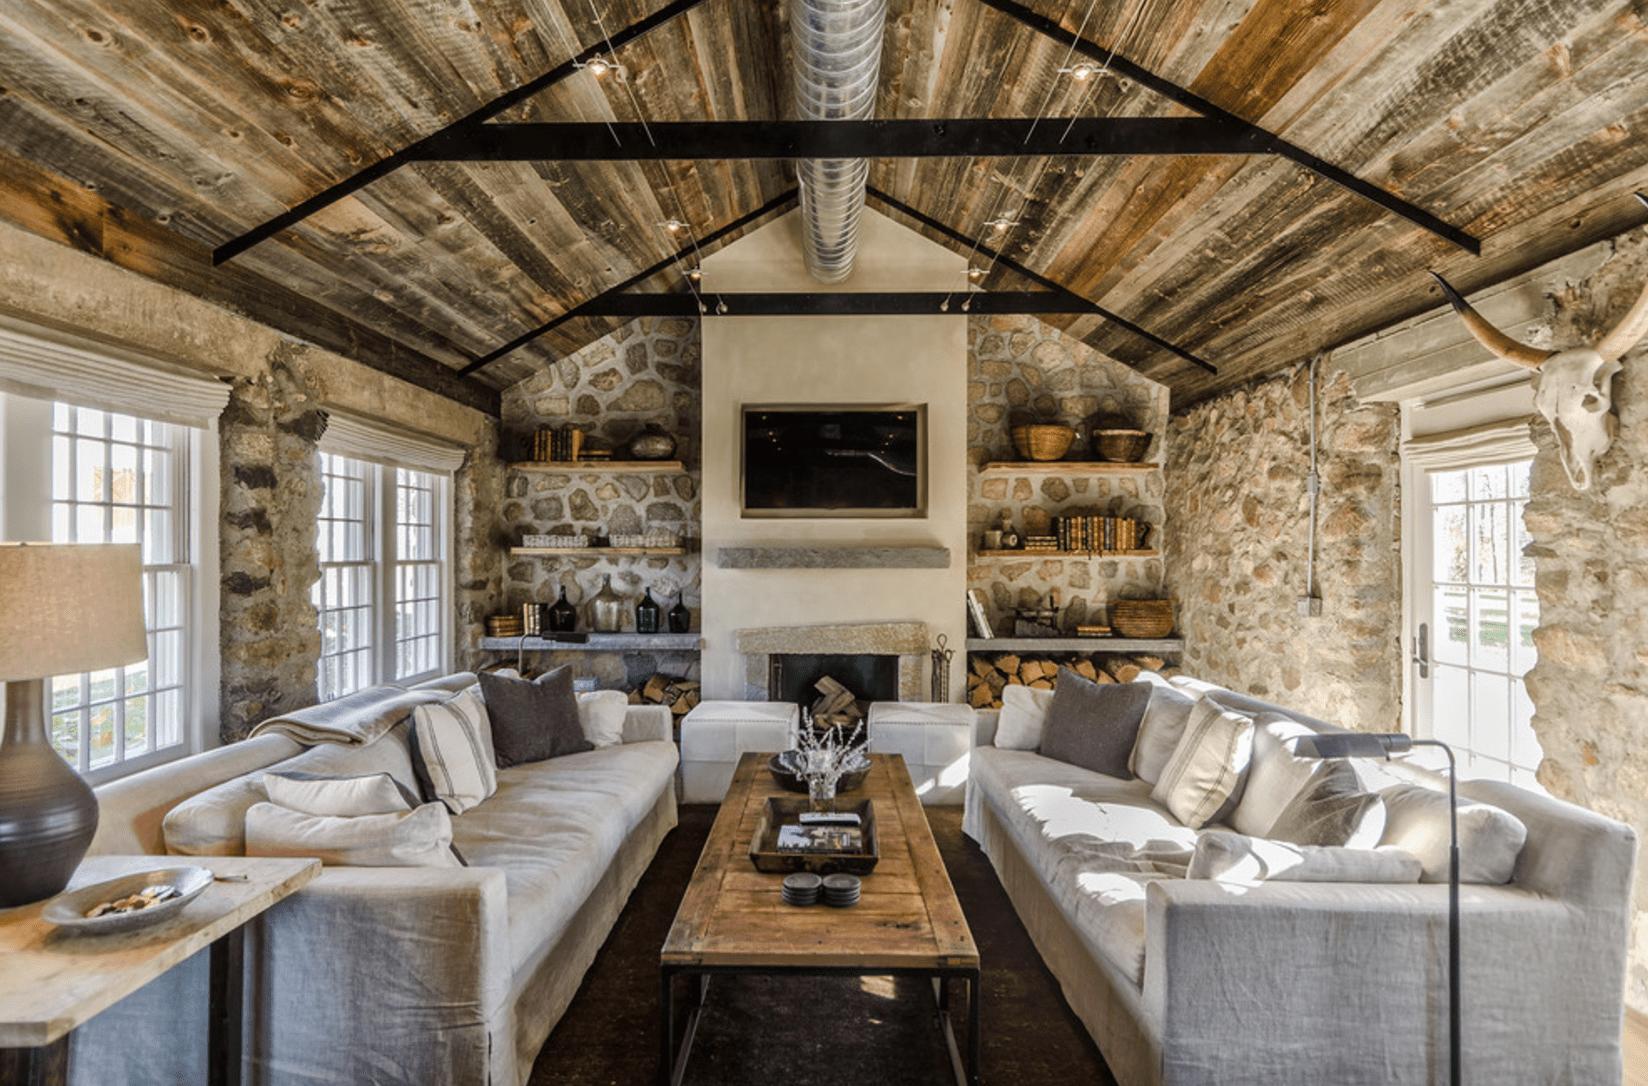 15 Farmhouse Style Living Room Tips